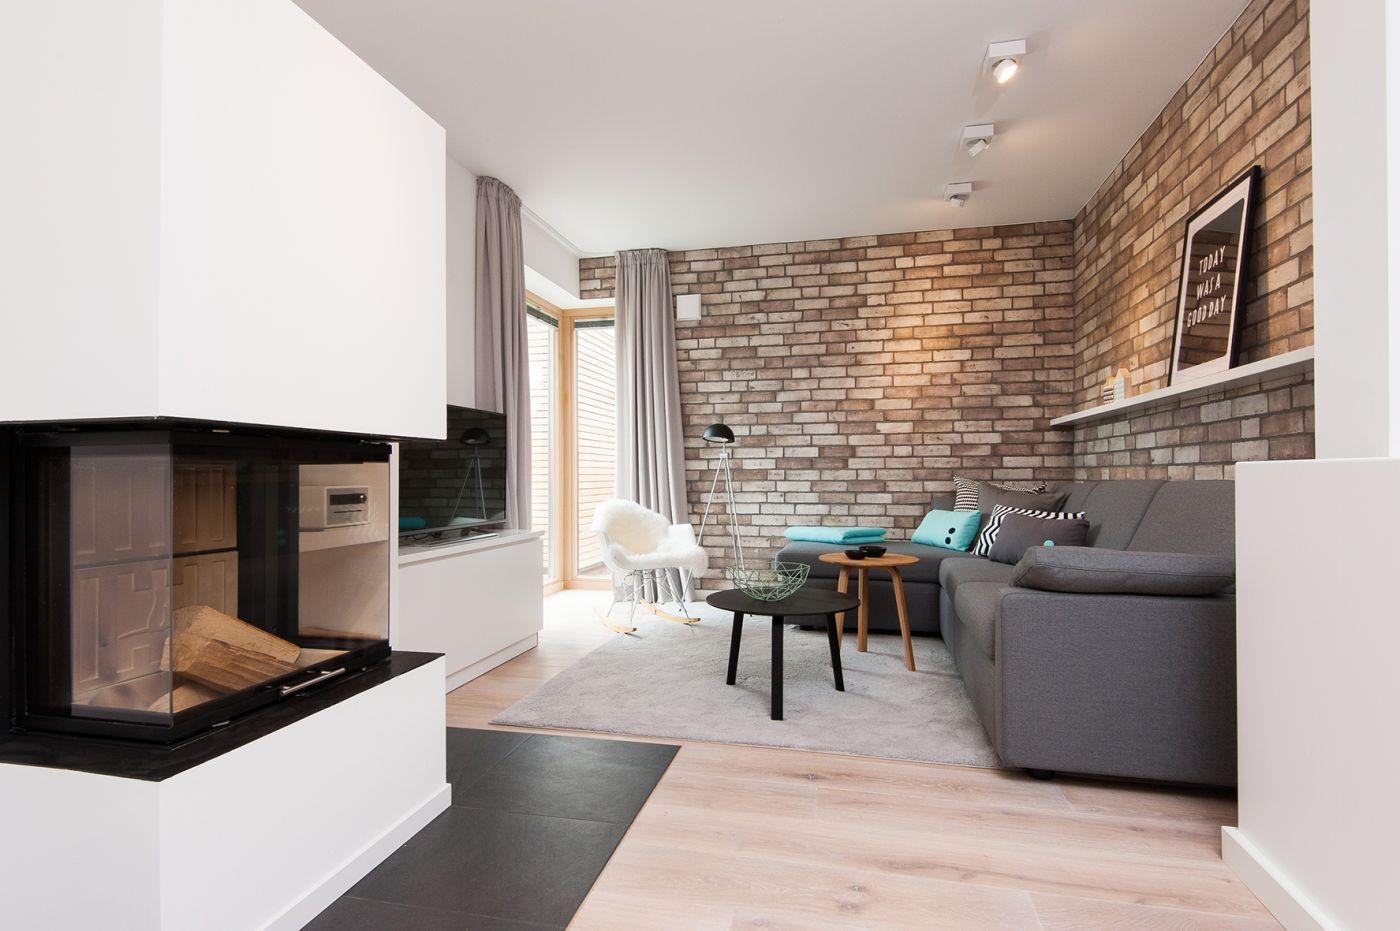 Modern Interior Design Laminate Use. Nice Stone Tiles At The Walls  Harmonize With The Laminate